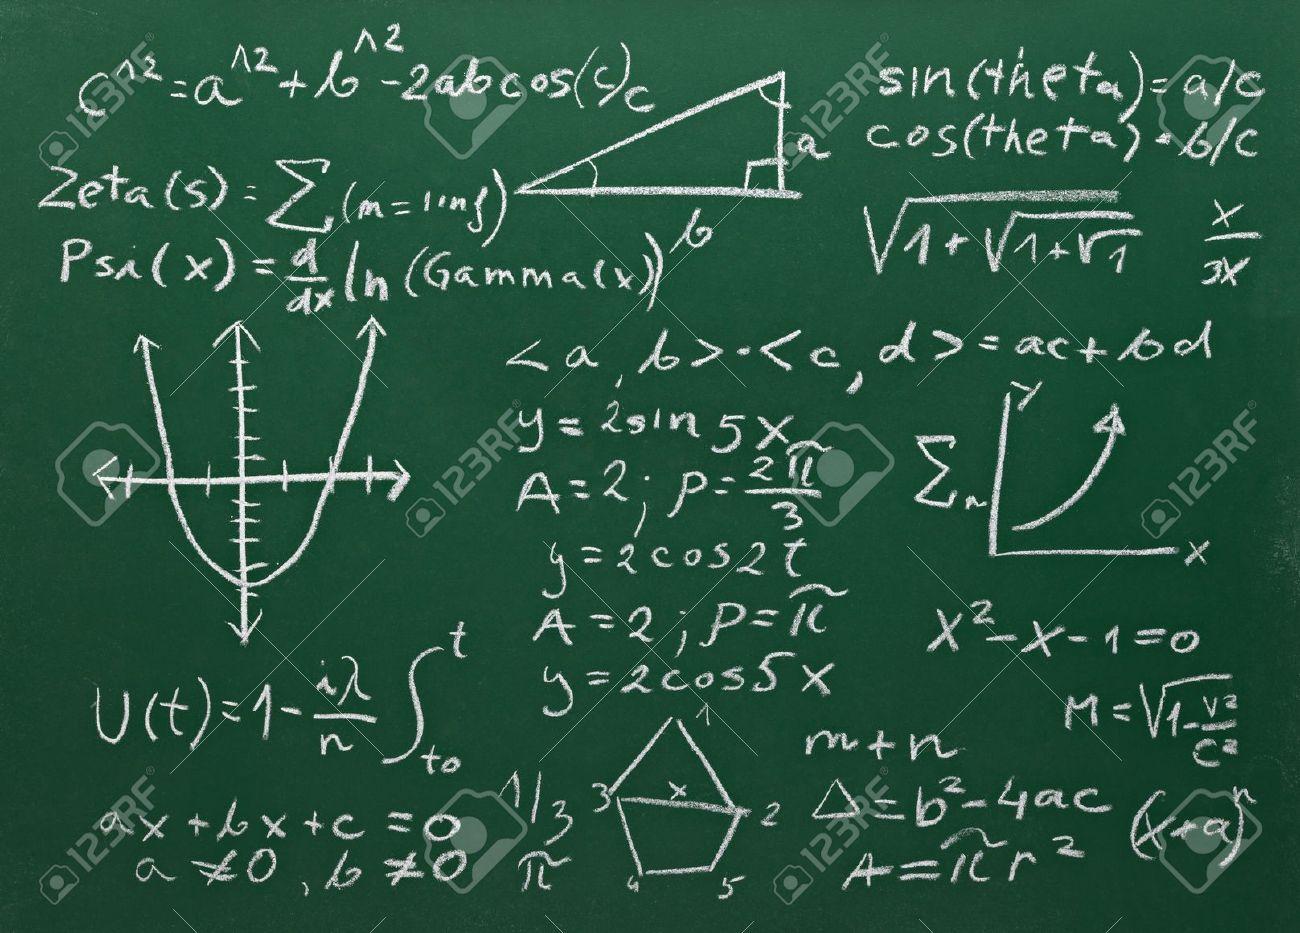 Clipart blackboard formulas clipground 5911 blackboard math stock illustrations cliparts and royalty biocorpaavc